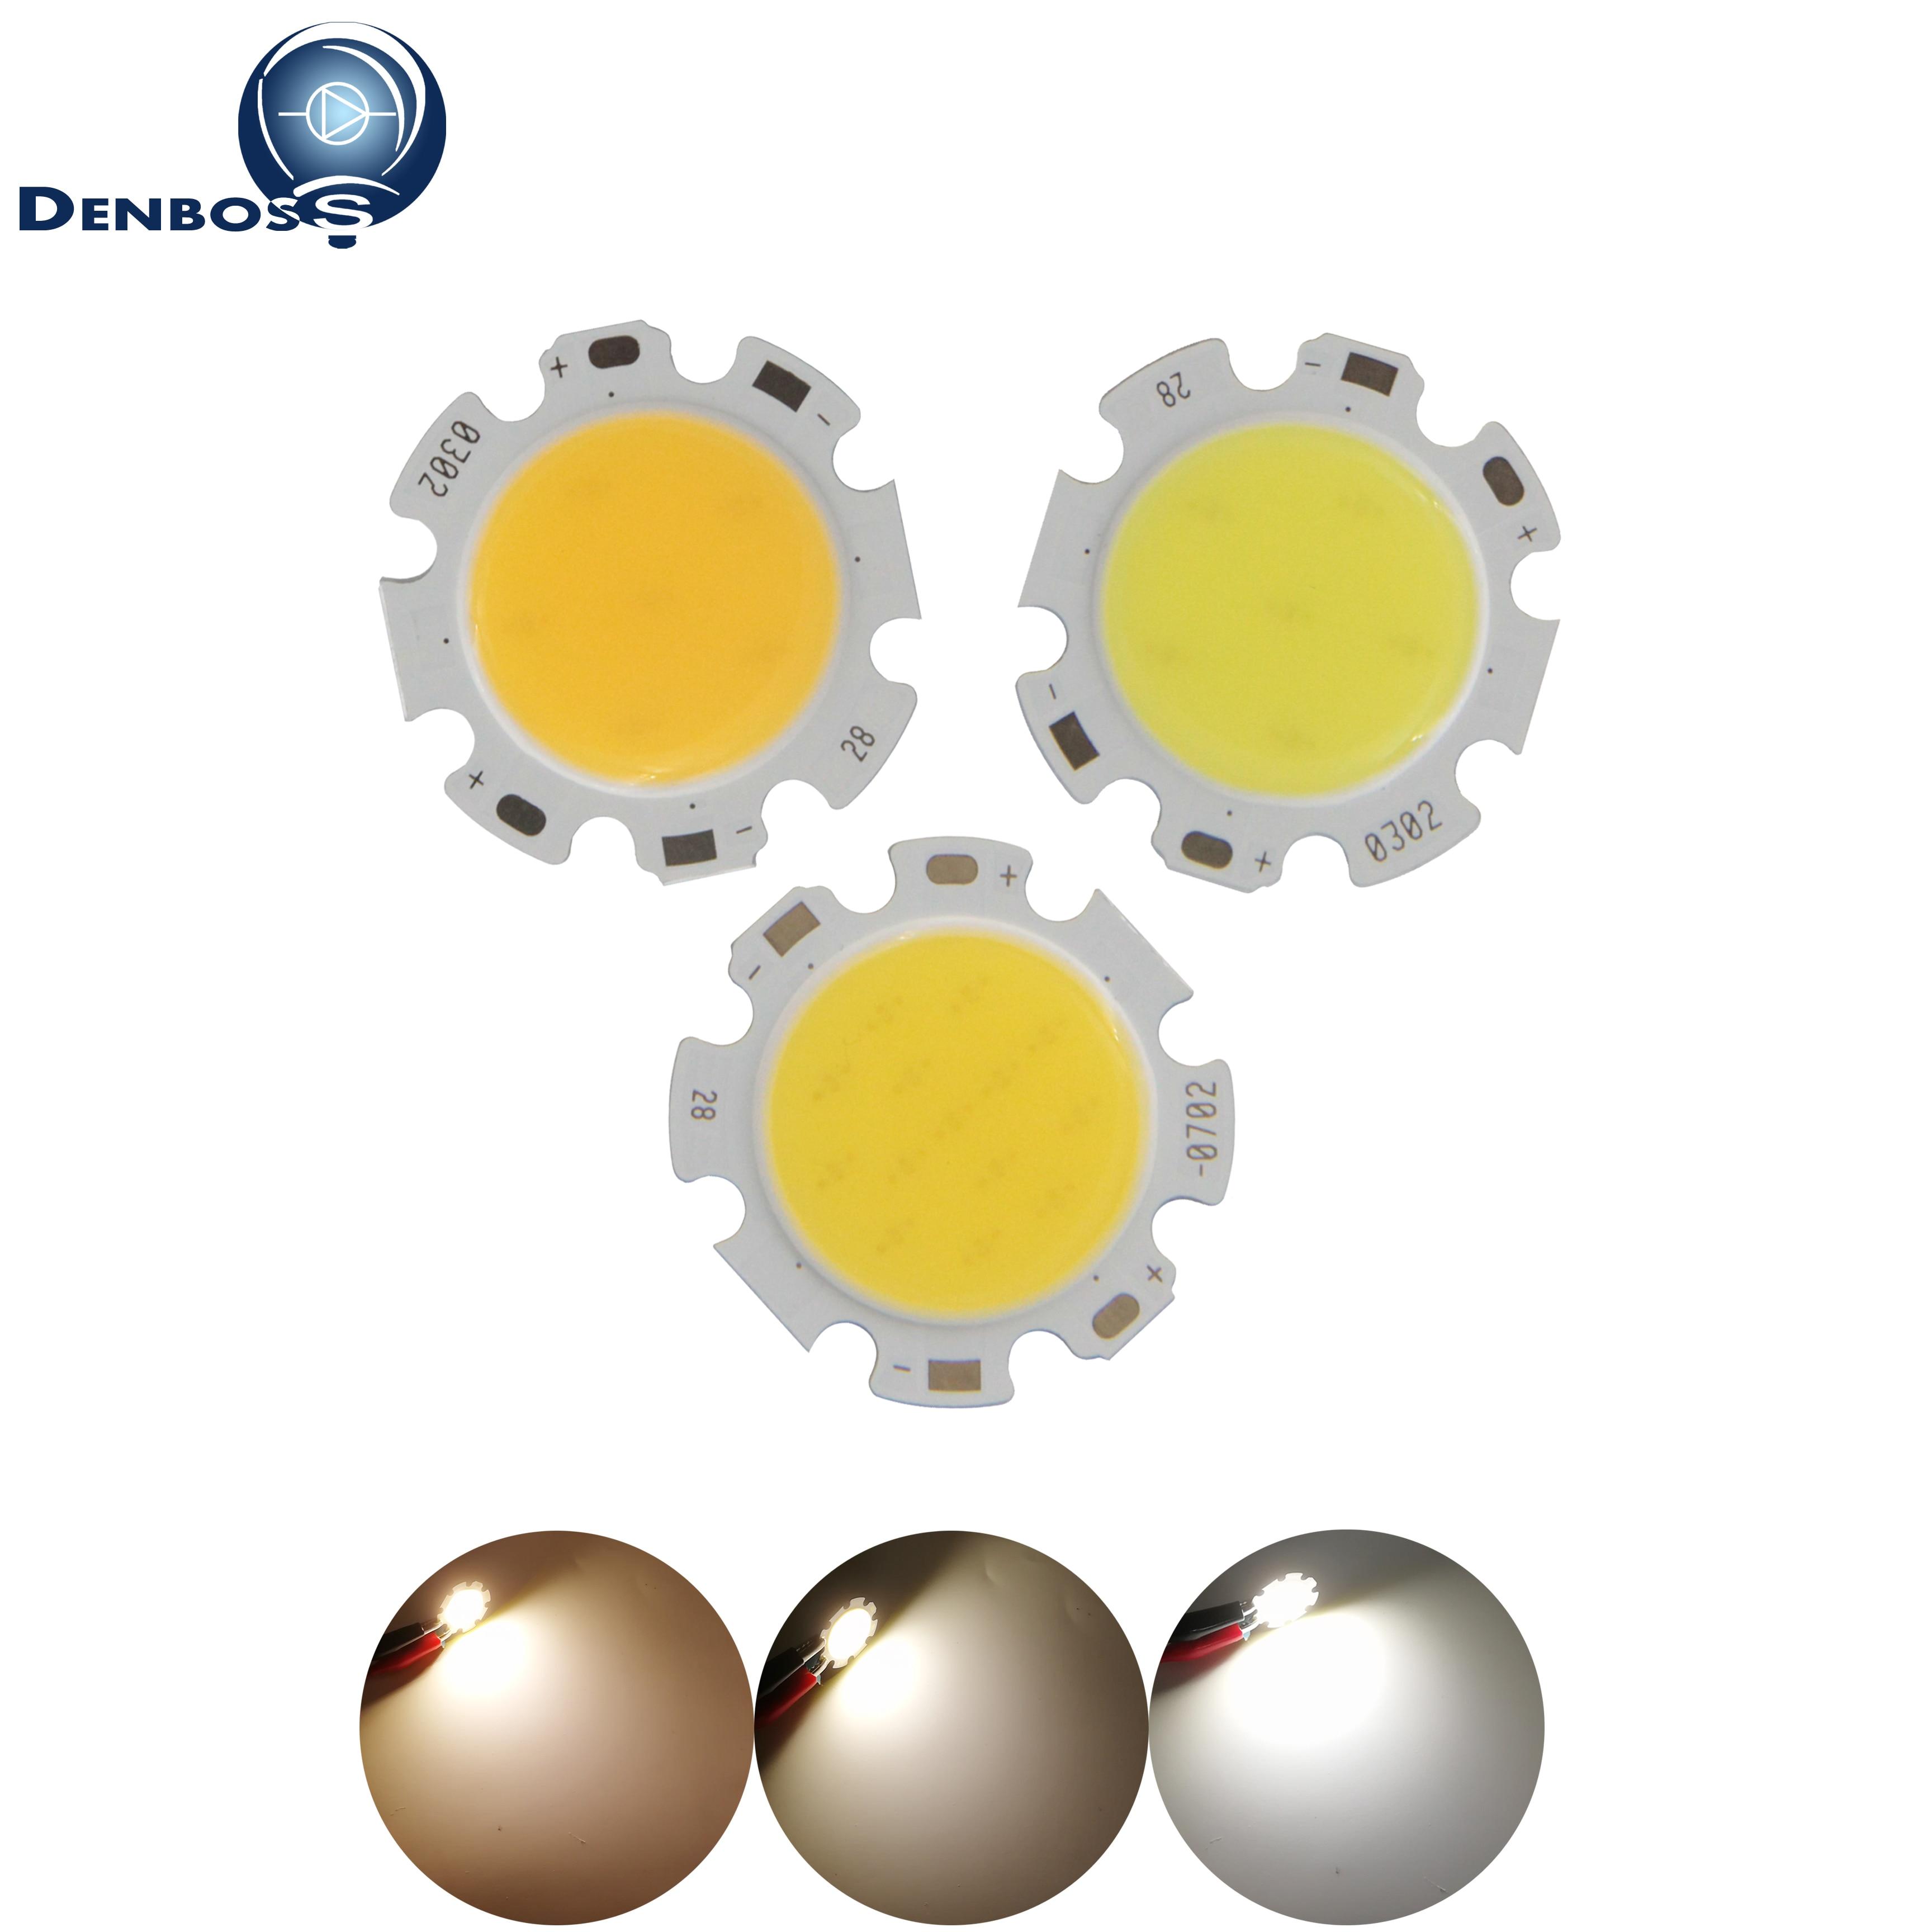 DENBOSS Manufacturer 28mm Round Aluminum LED COB Light Source Module 3W 5W 7W 10W 12W COB Bulb Lamp Flip Chips For Spotlight